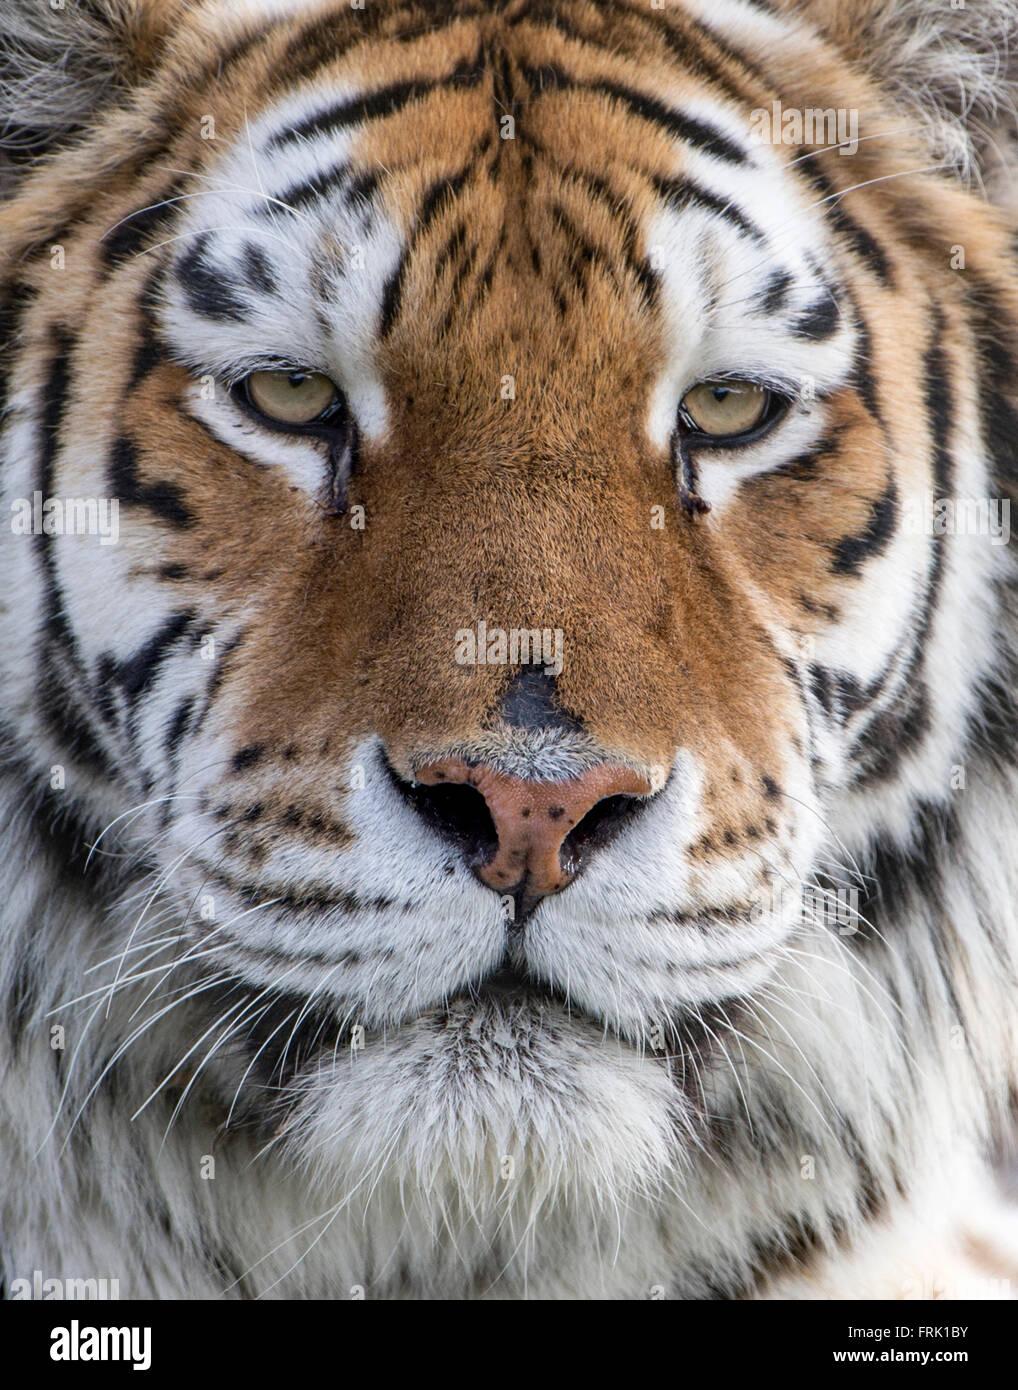 Female Amur (Siberian) tiger (extreme close-up) - Stock Image